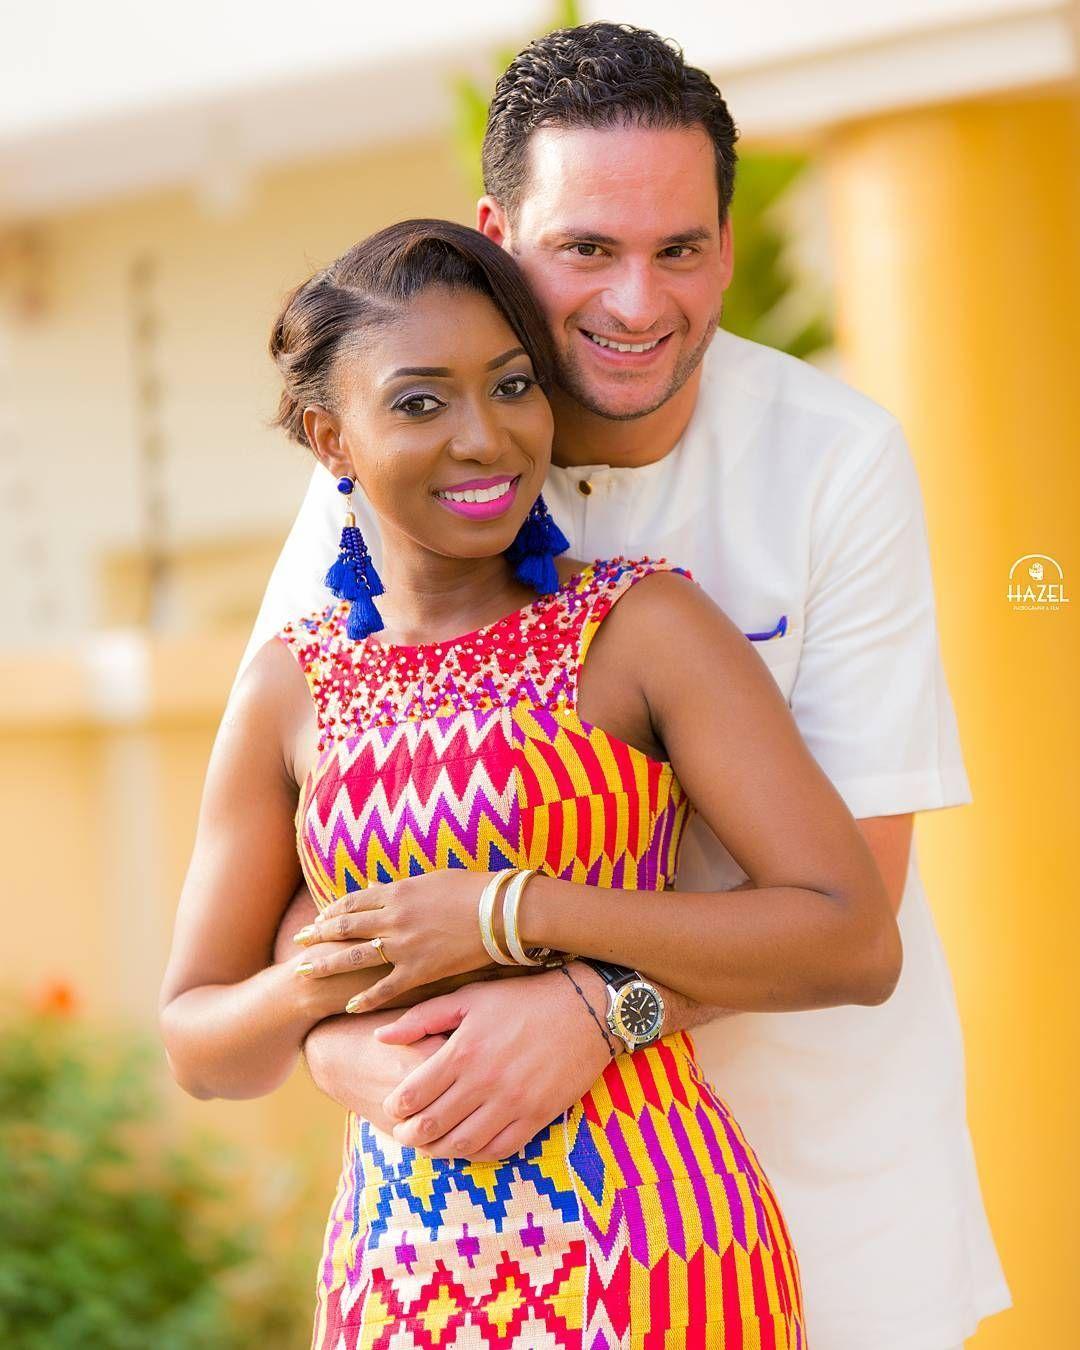 ghanaian dating